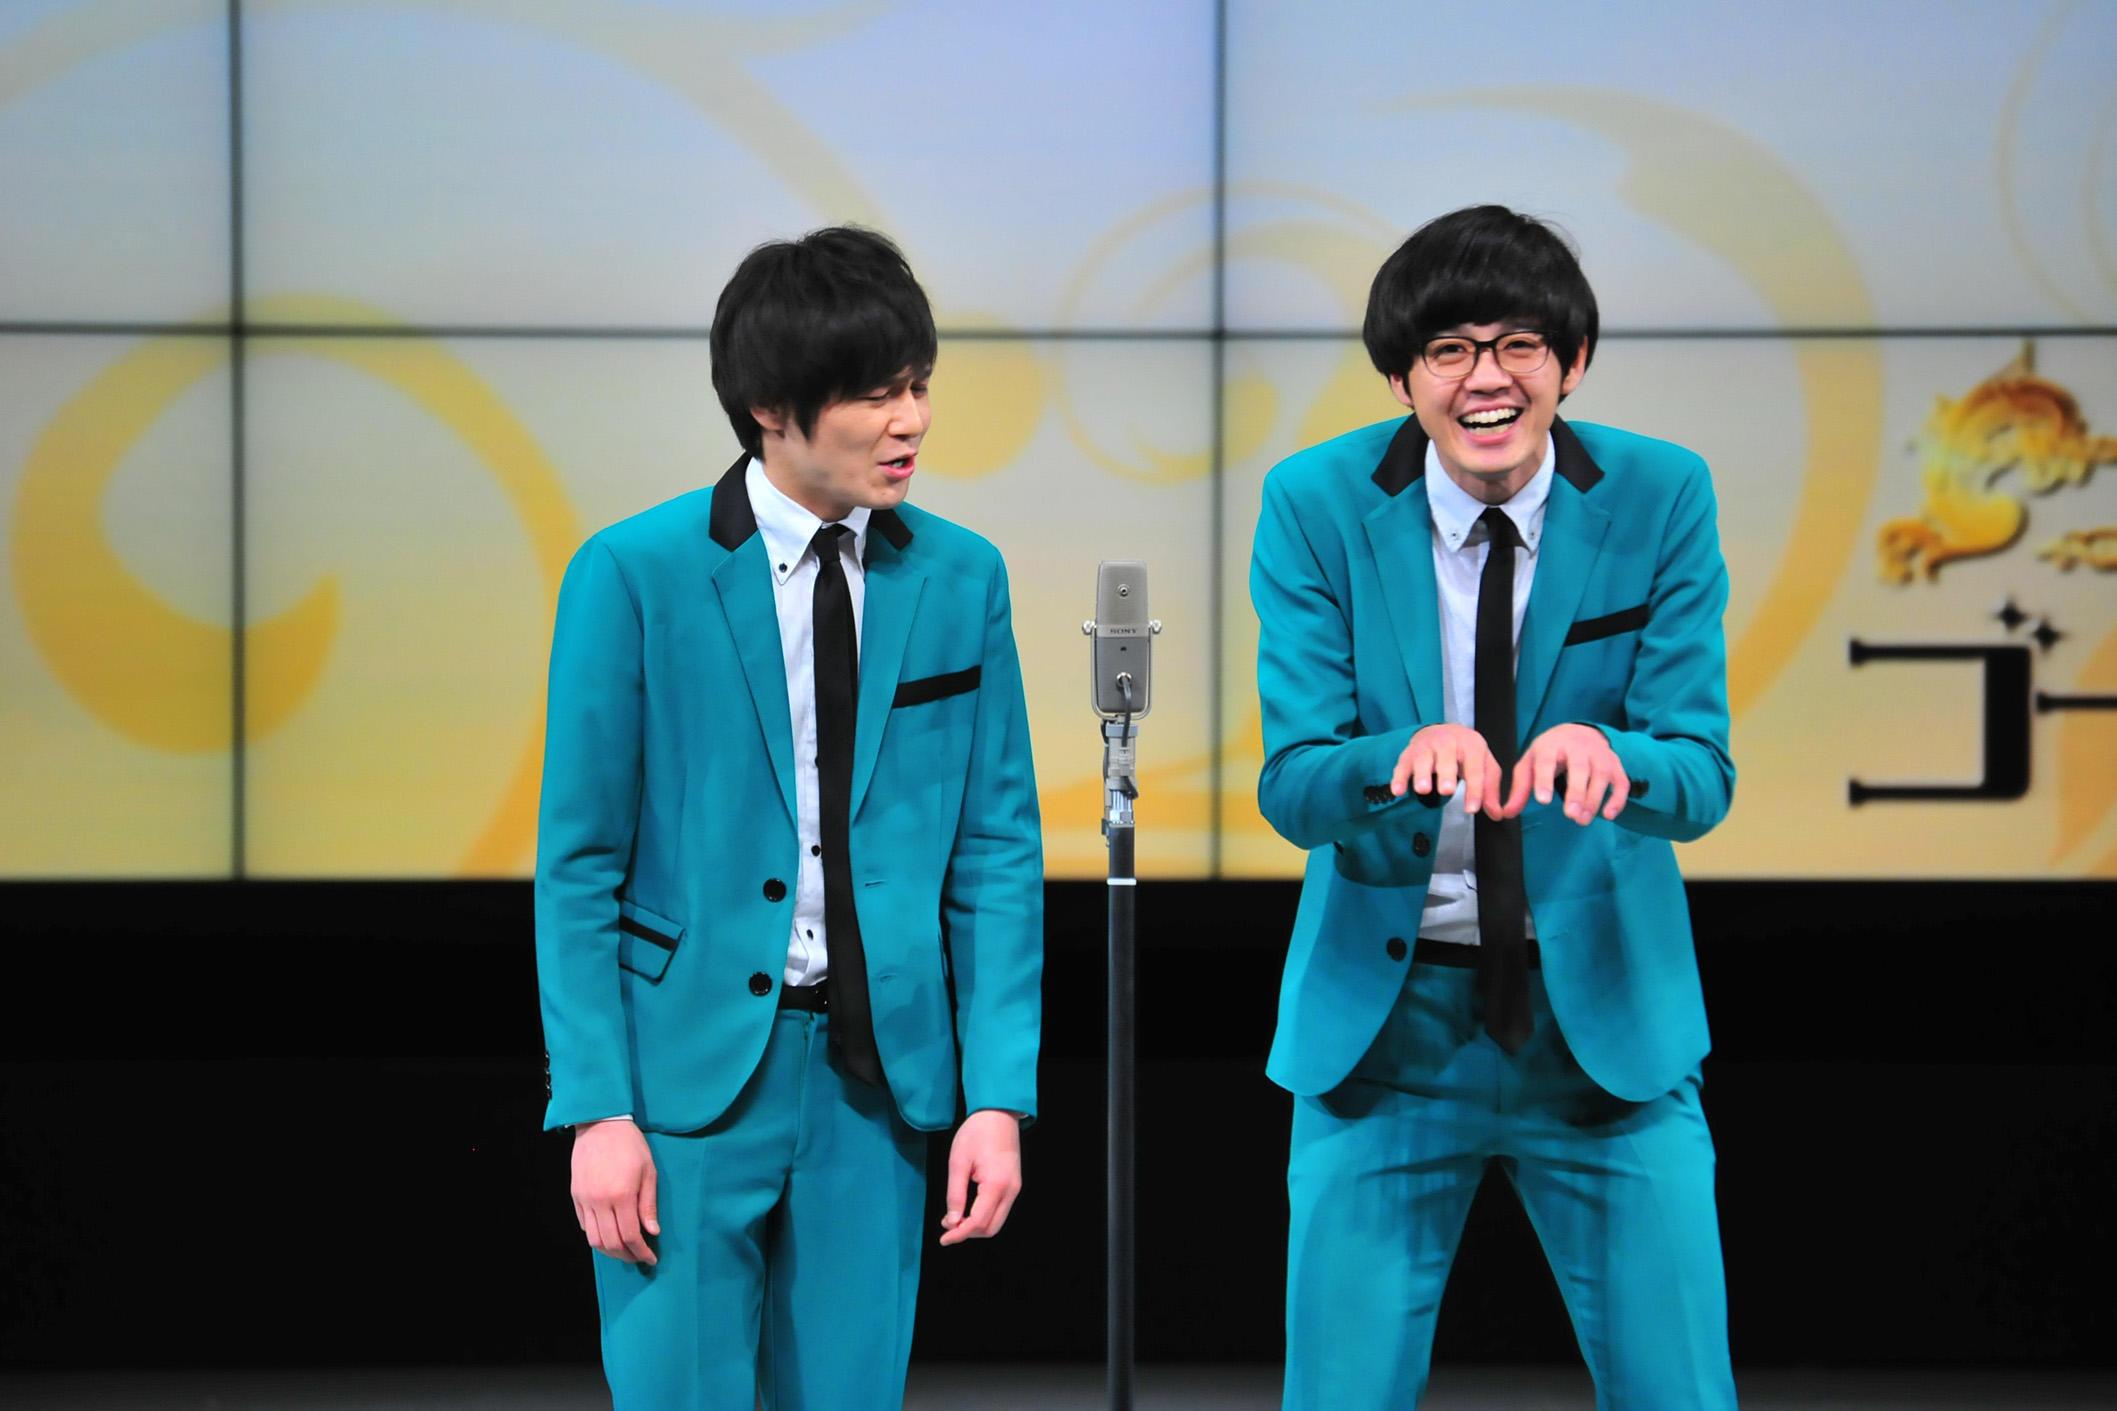 http://news.yoshimoto.co.jp/20160421122059-8218114f8242c809da9e7425f737032204e2cffa.jpg